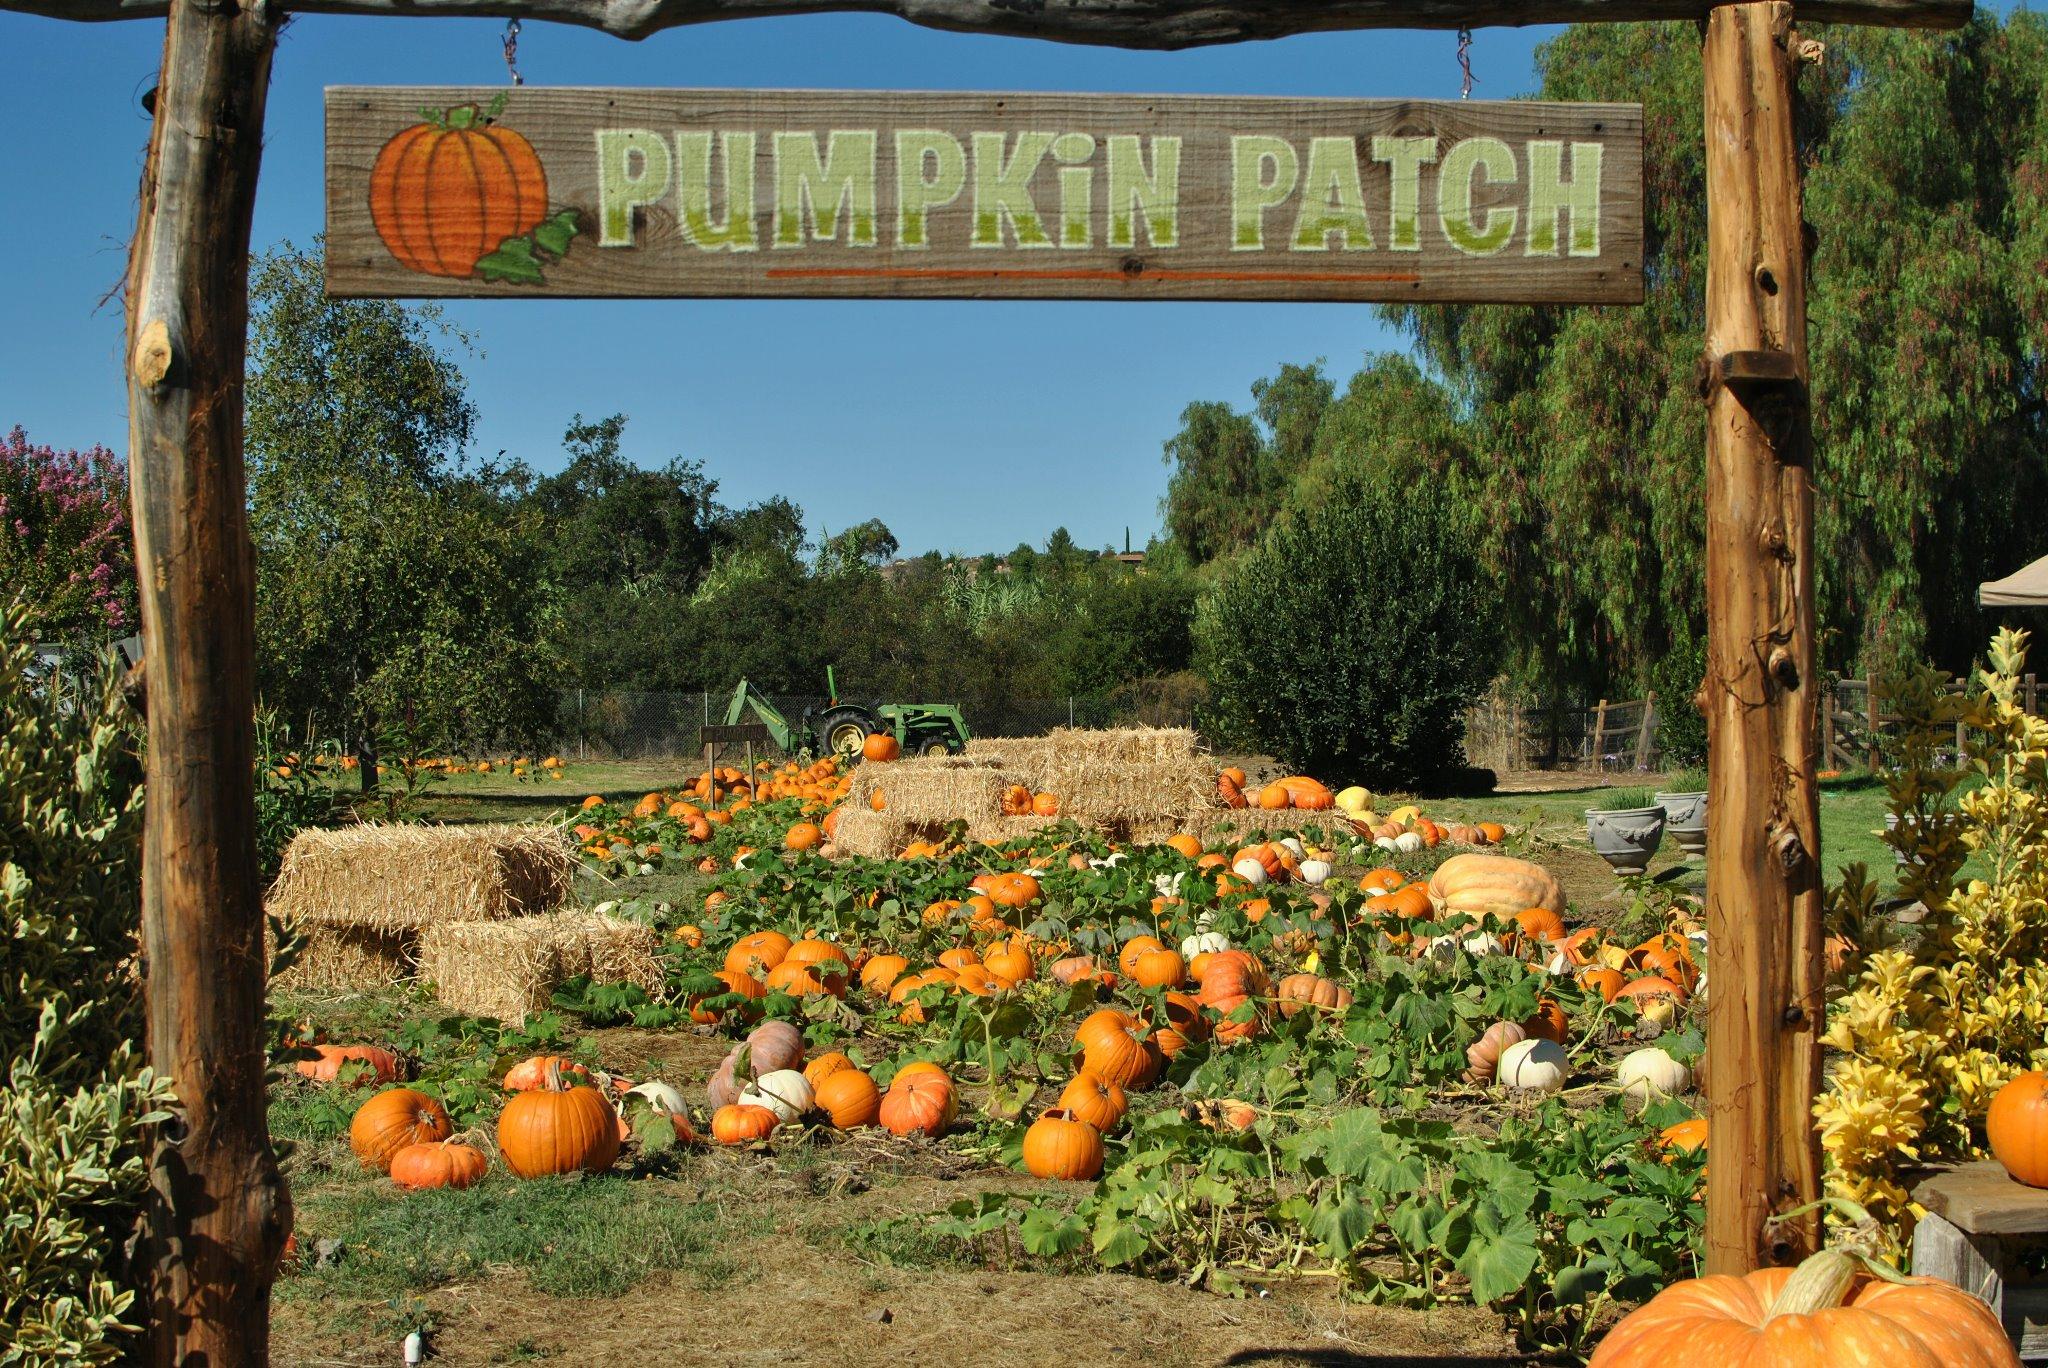 Variety picture of lavender hill pumpkins, fallbrook tripadvisor.